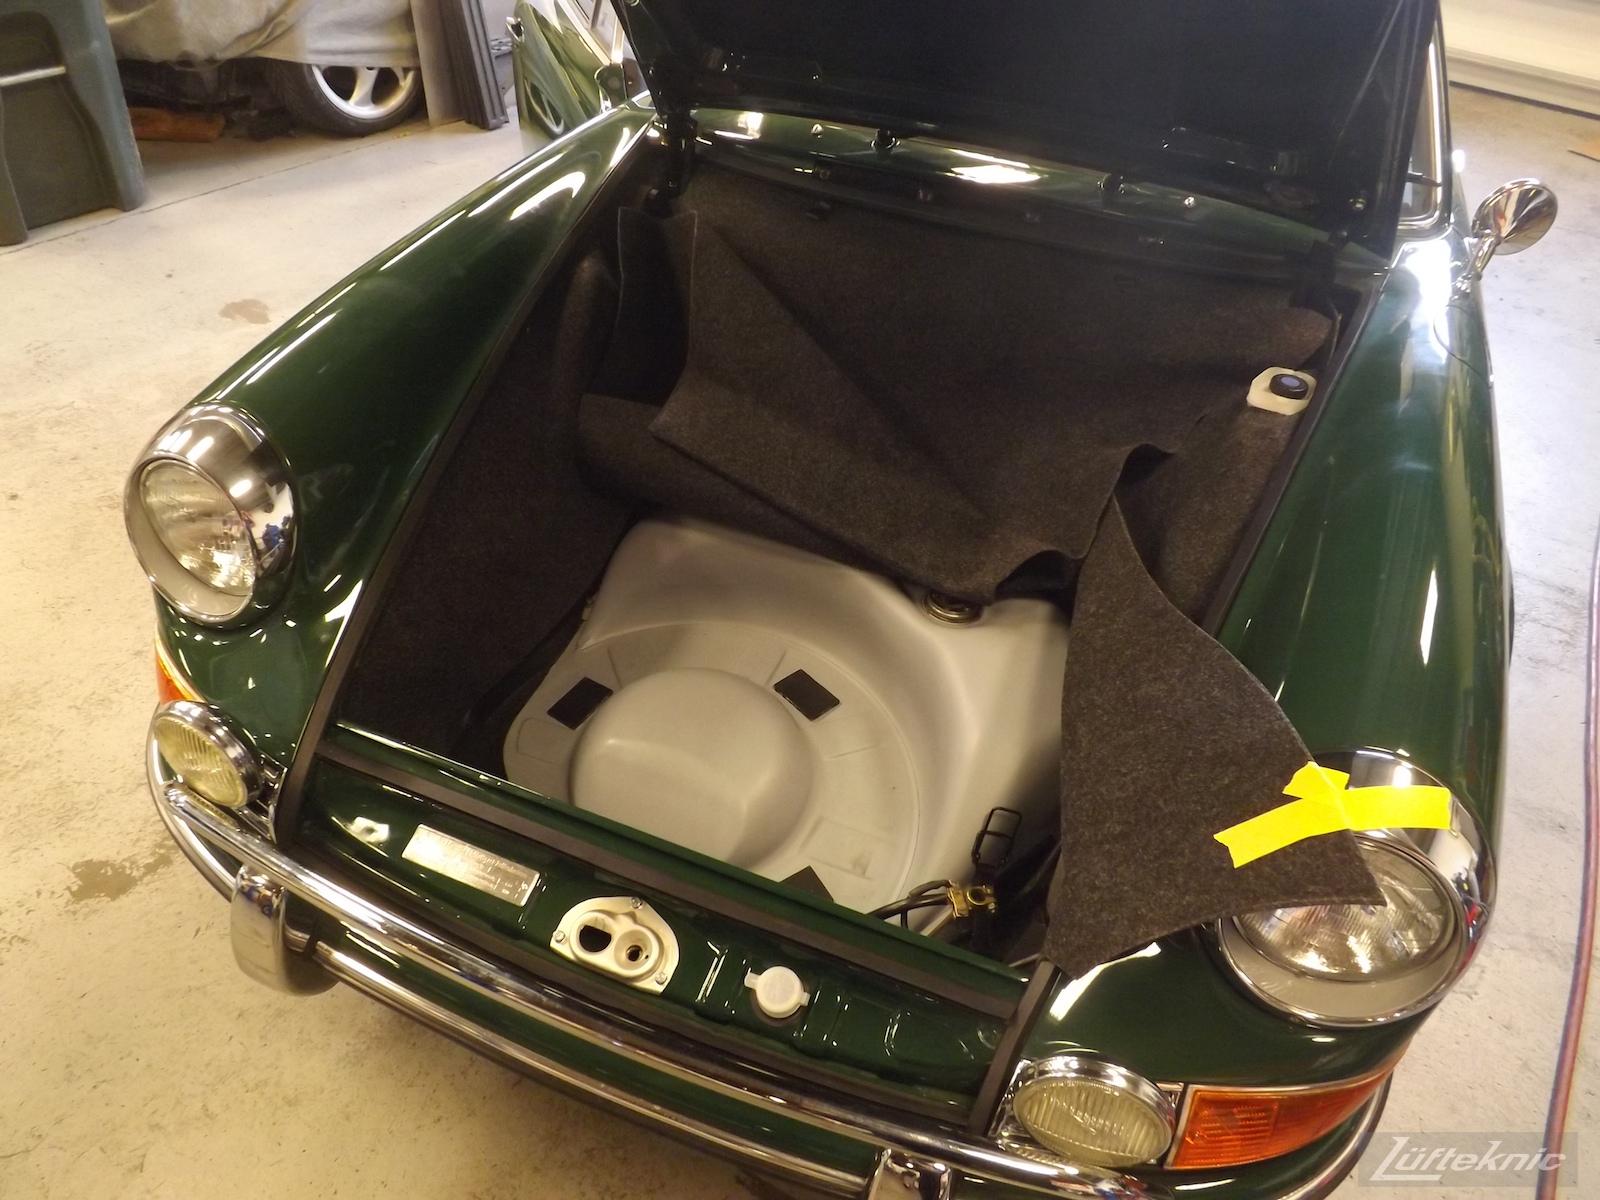 Finishing the carpet un the front trunk for an Irish Green Porsche 912 undergoing restoration at Lufteknic.